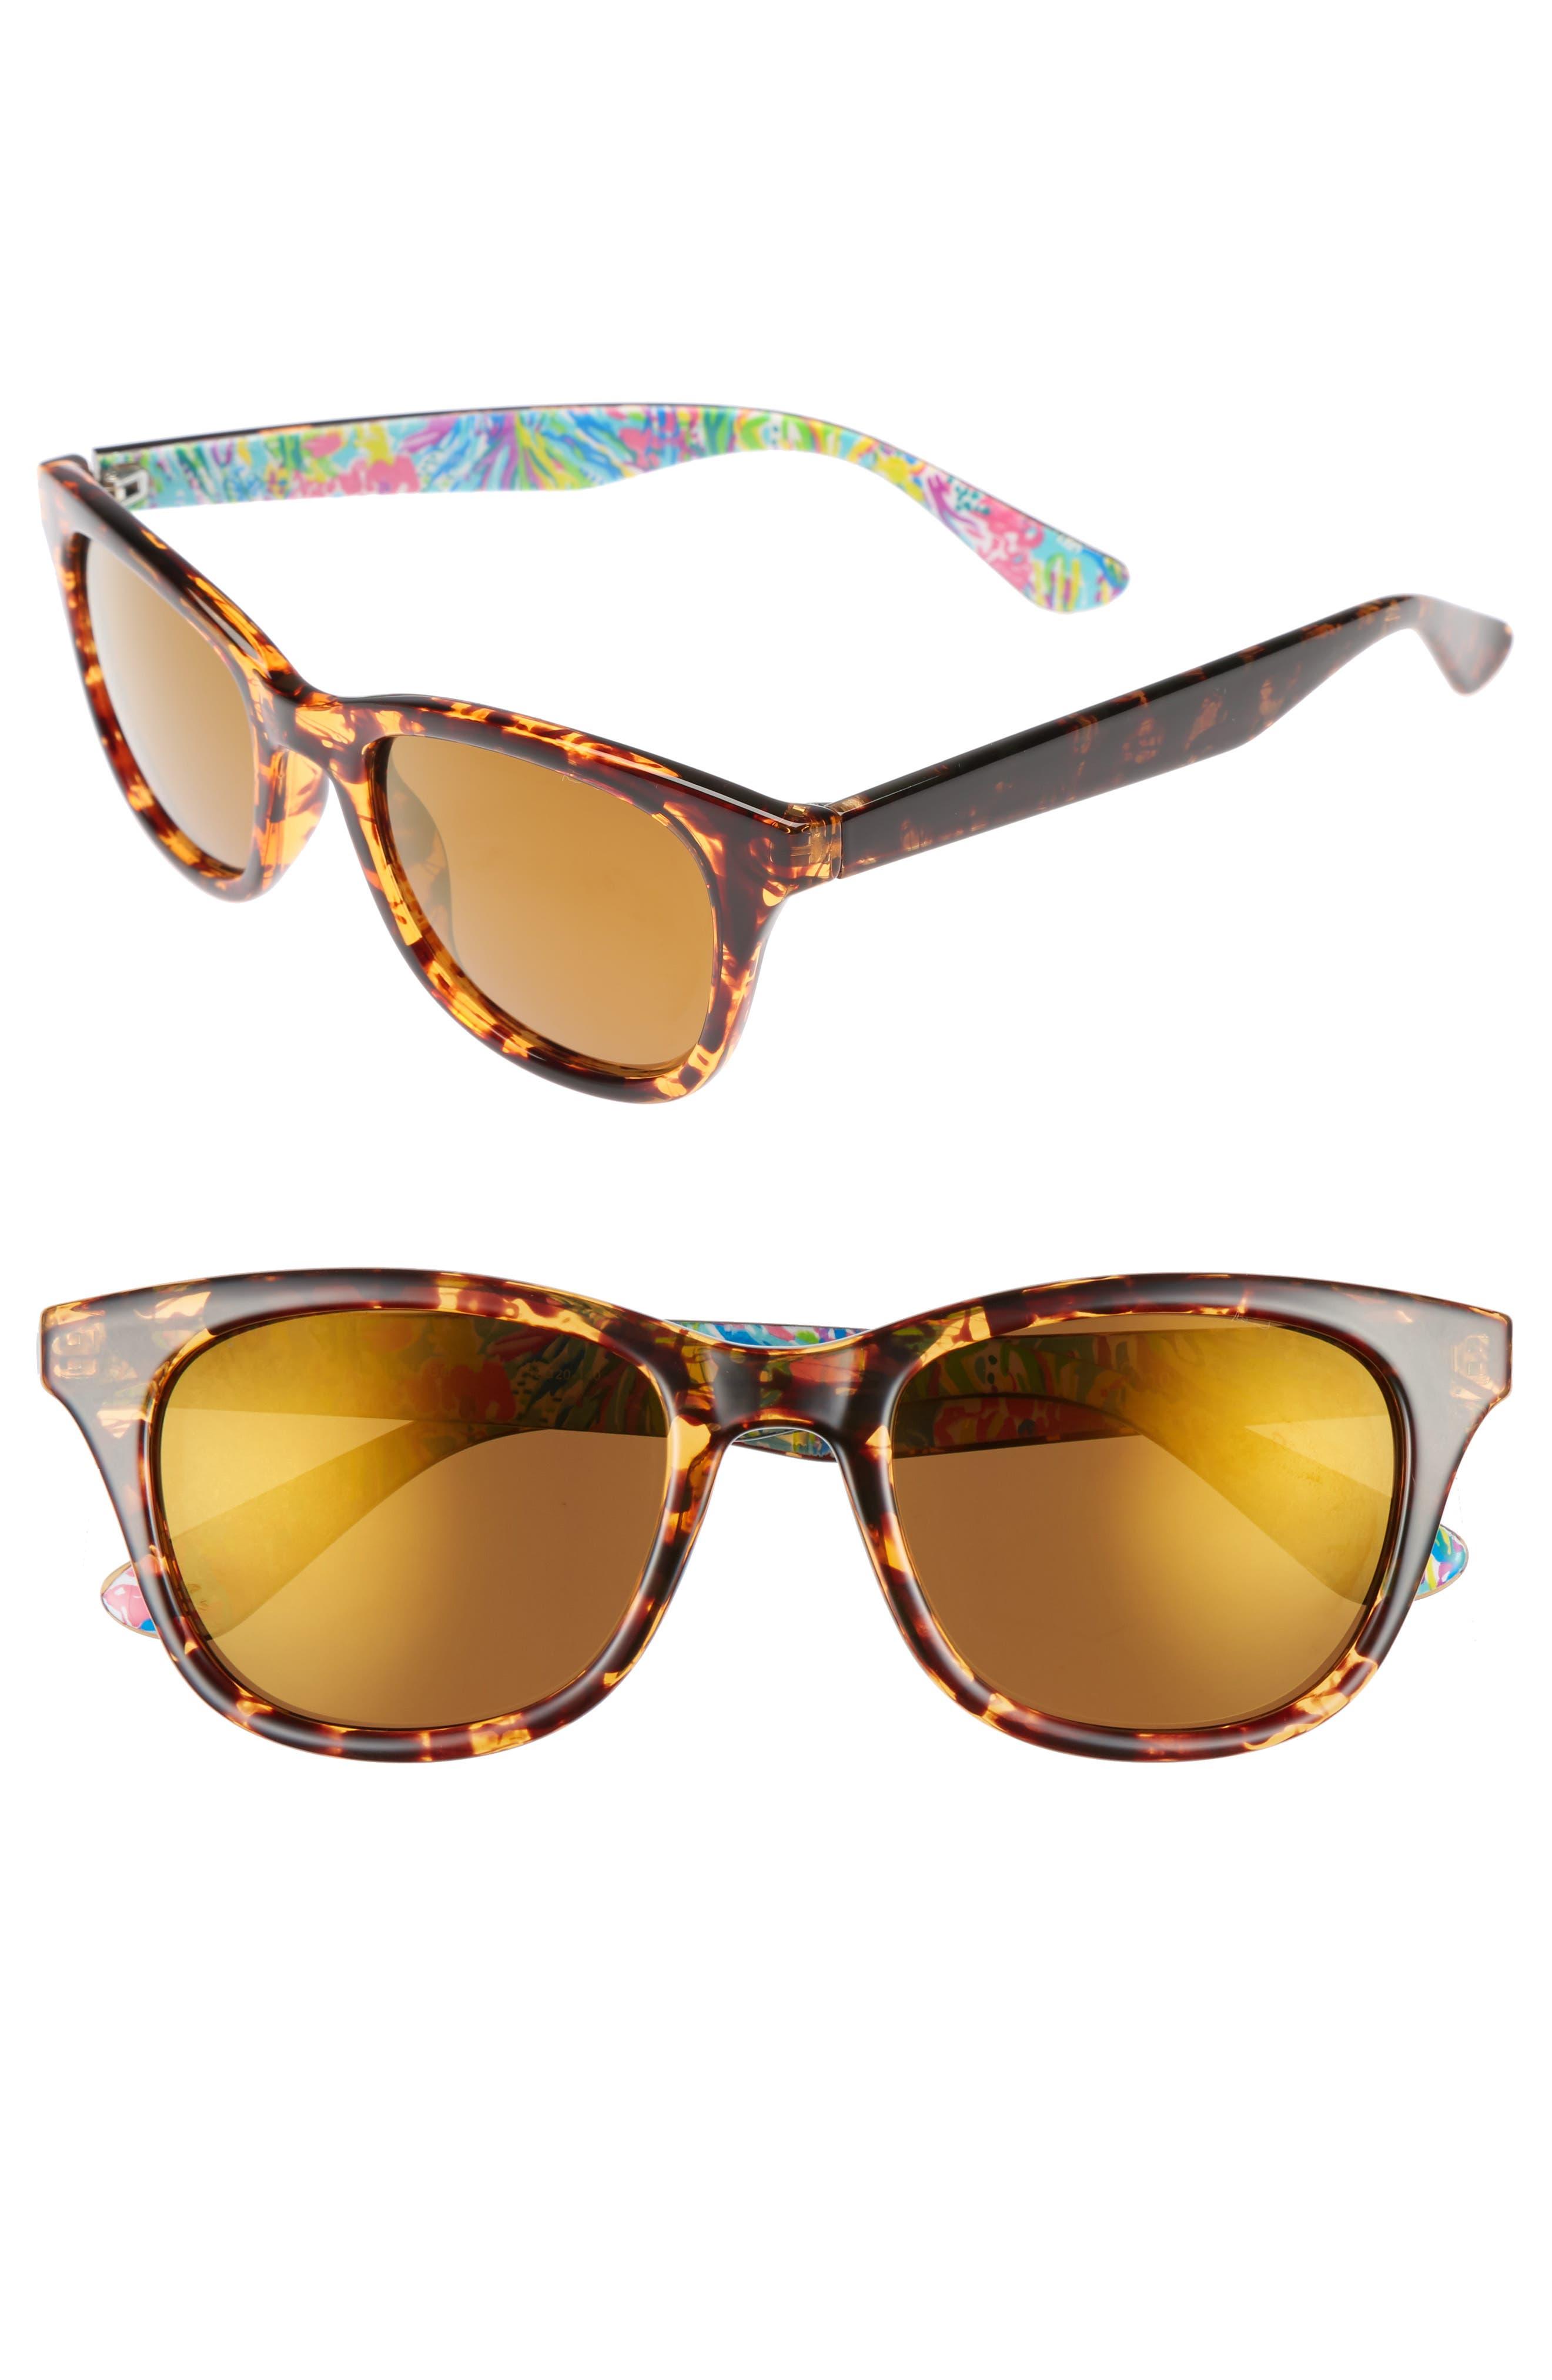 Main Image - Lilly Pulitzer® Maddie 52mm Polarized Mirrored Sunglasses